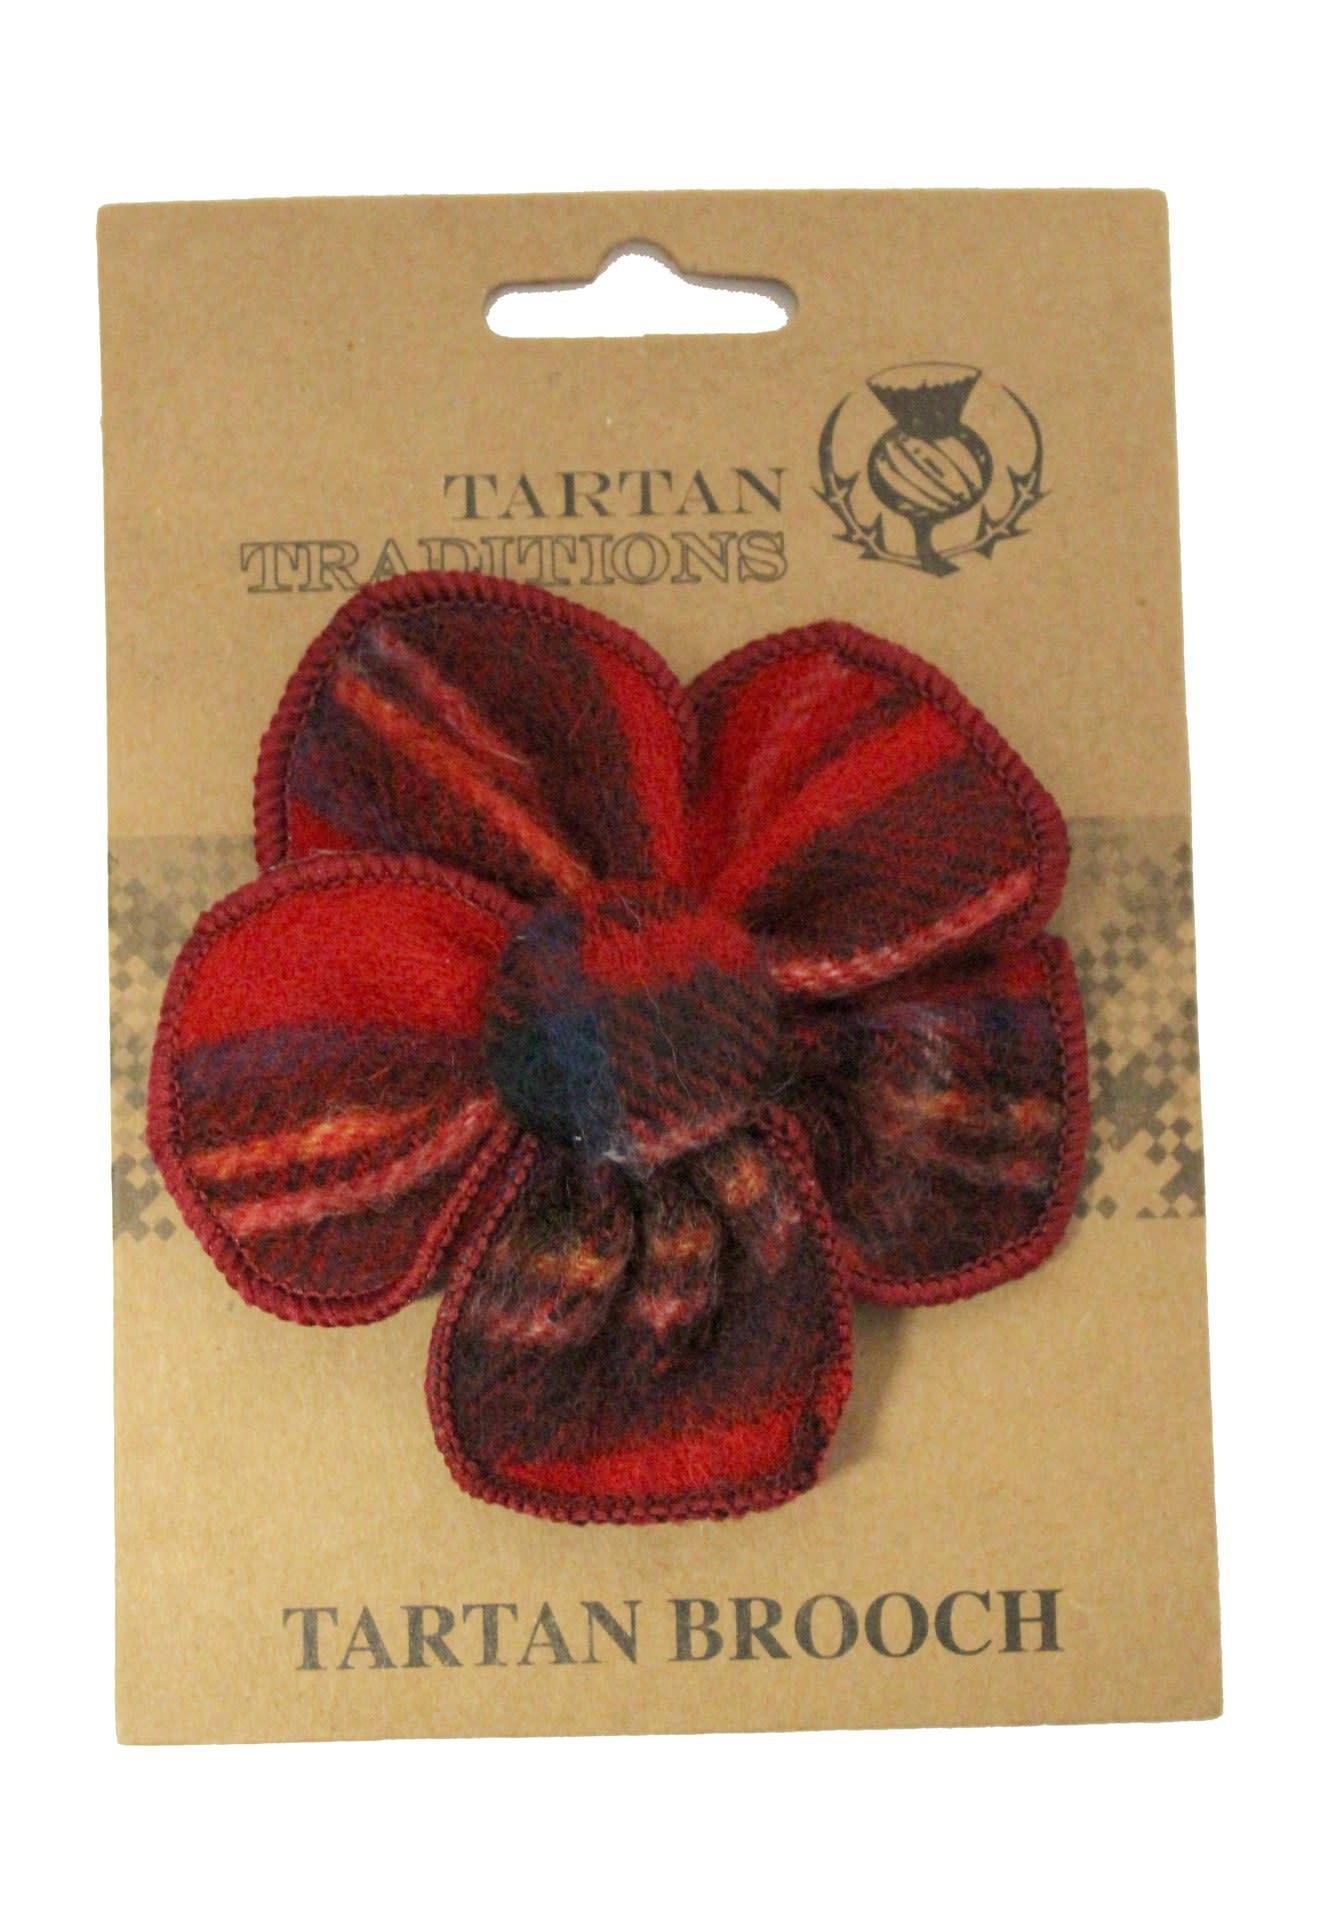 Brooch: Tartan Royal Stewart